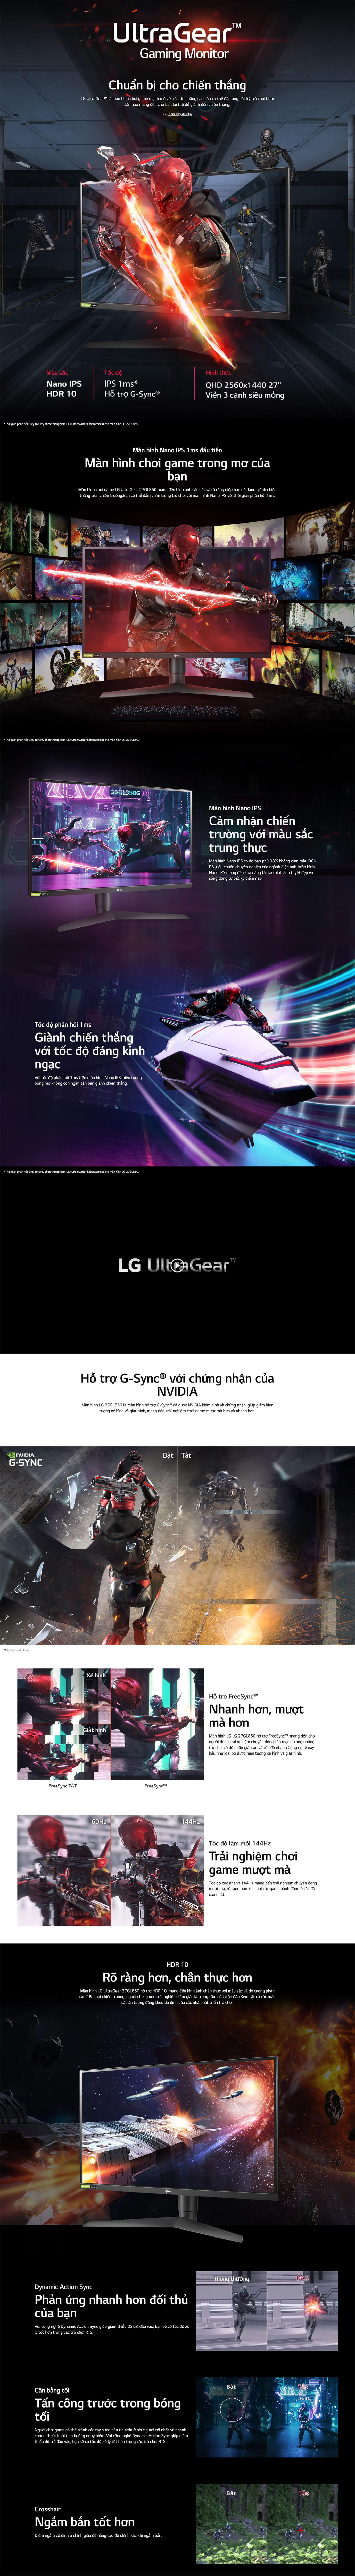 "LG 27GL850 UltraGear™ Nano IPS 1ms Gaming Freesync (IPS 27"" 2K 144Hz)"